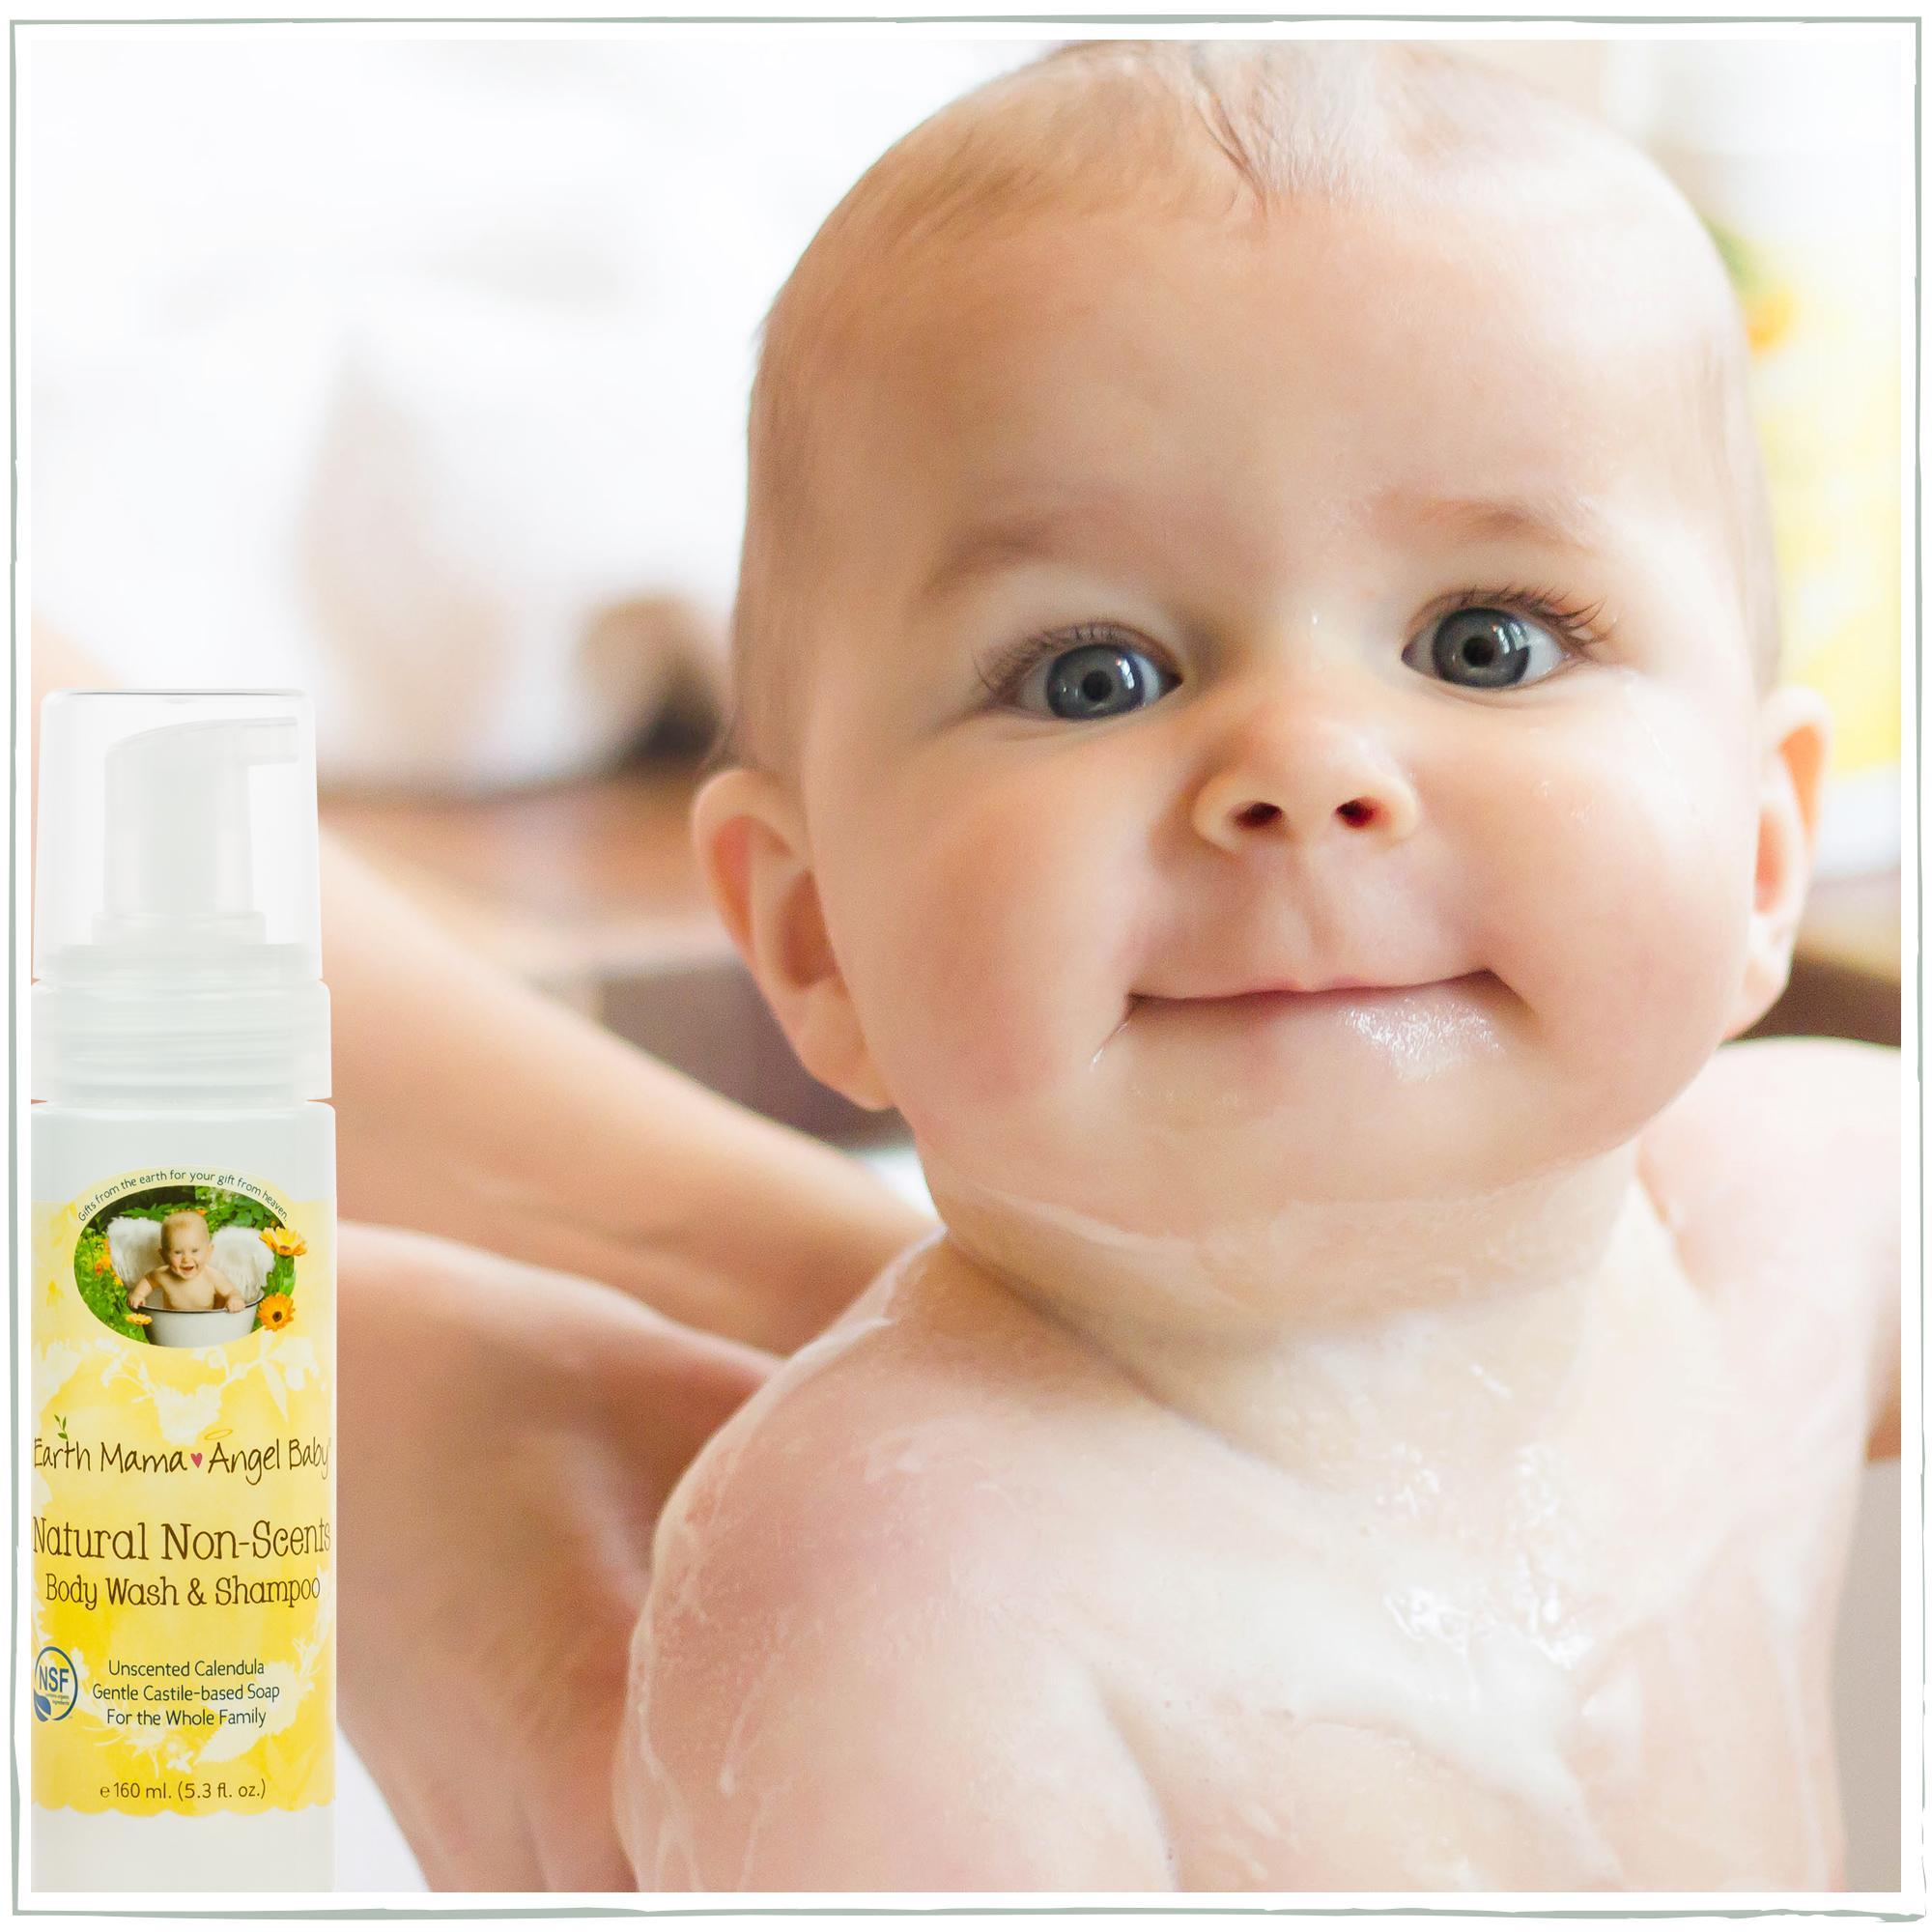 Amazon.com: Earth Mama Natural Non-Scents Baby Wash Gentle